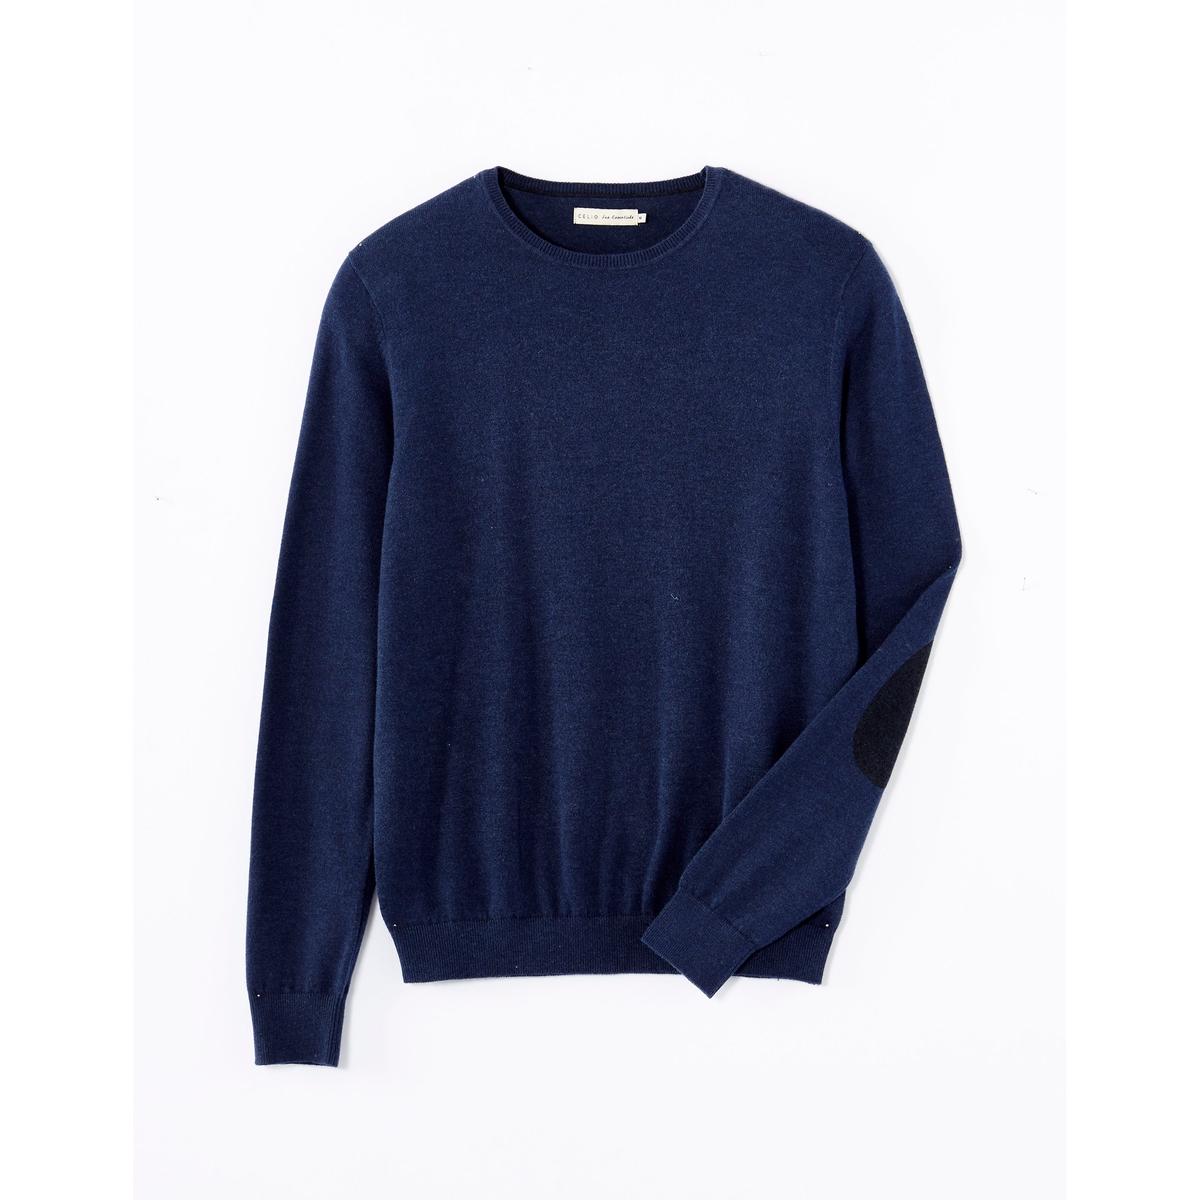 Пуловер с налокотниками Feria